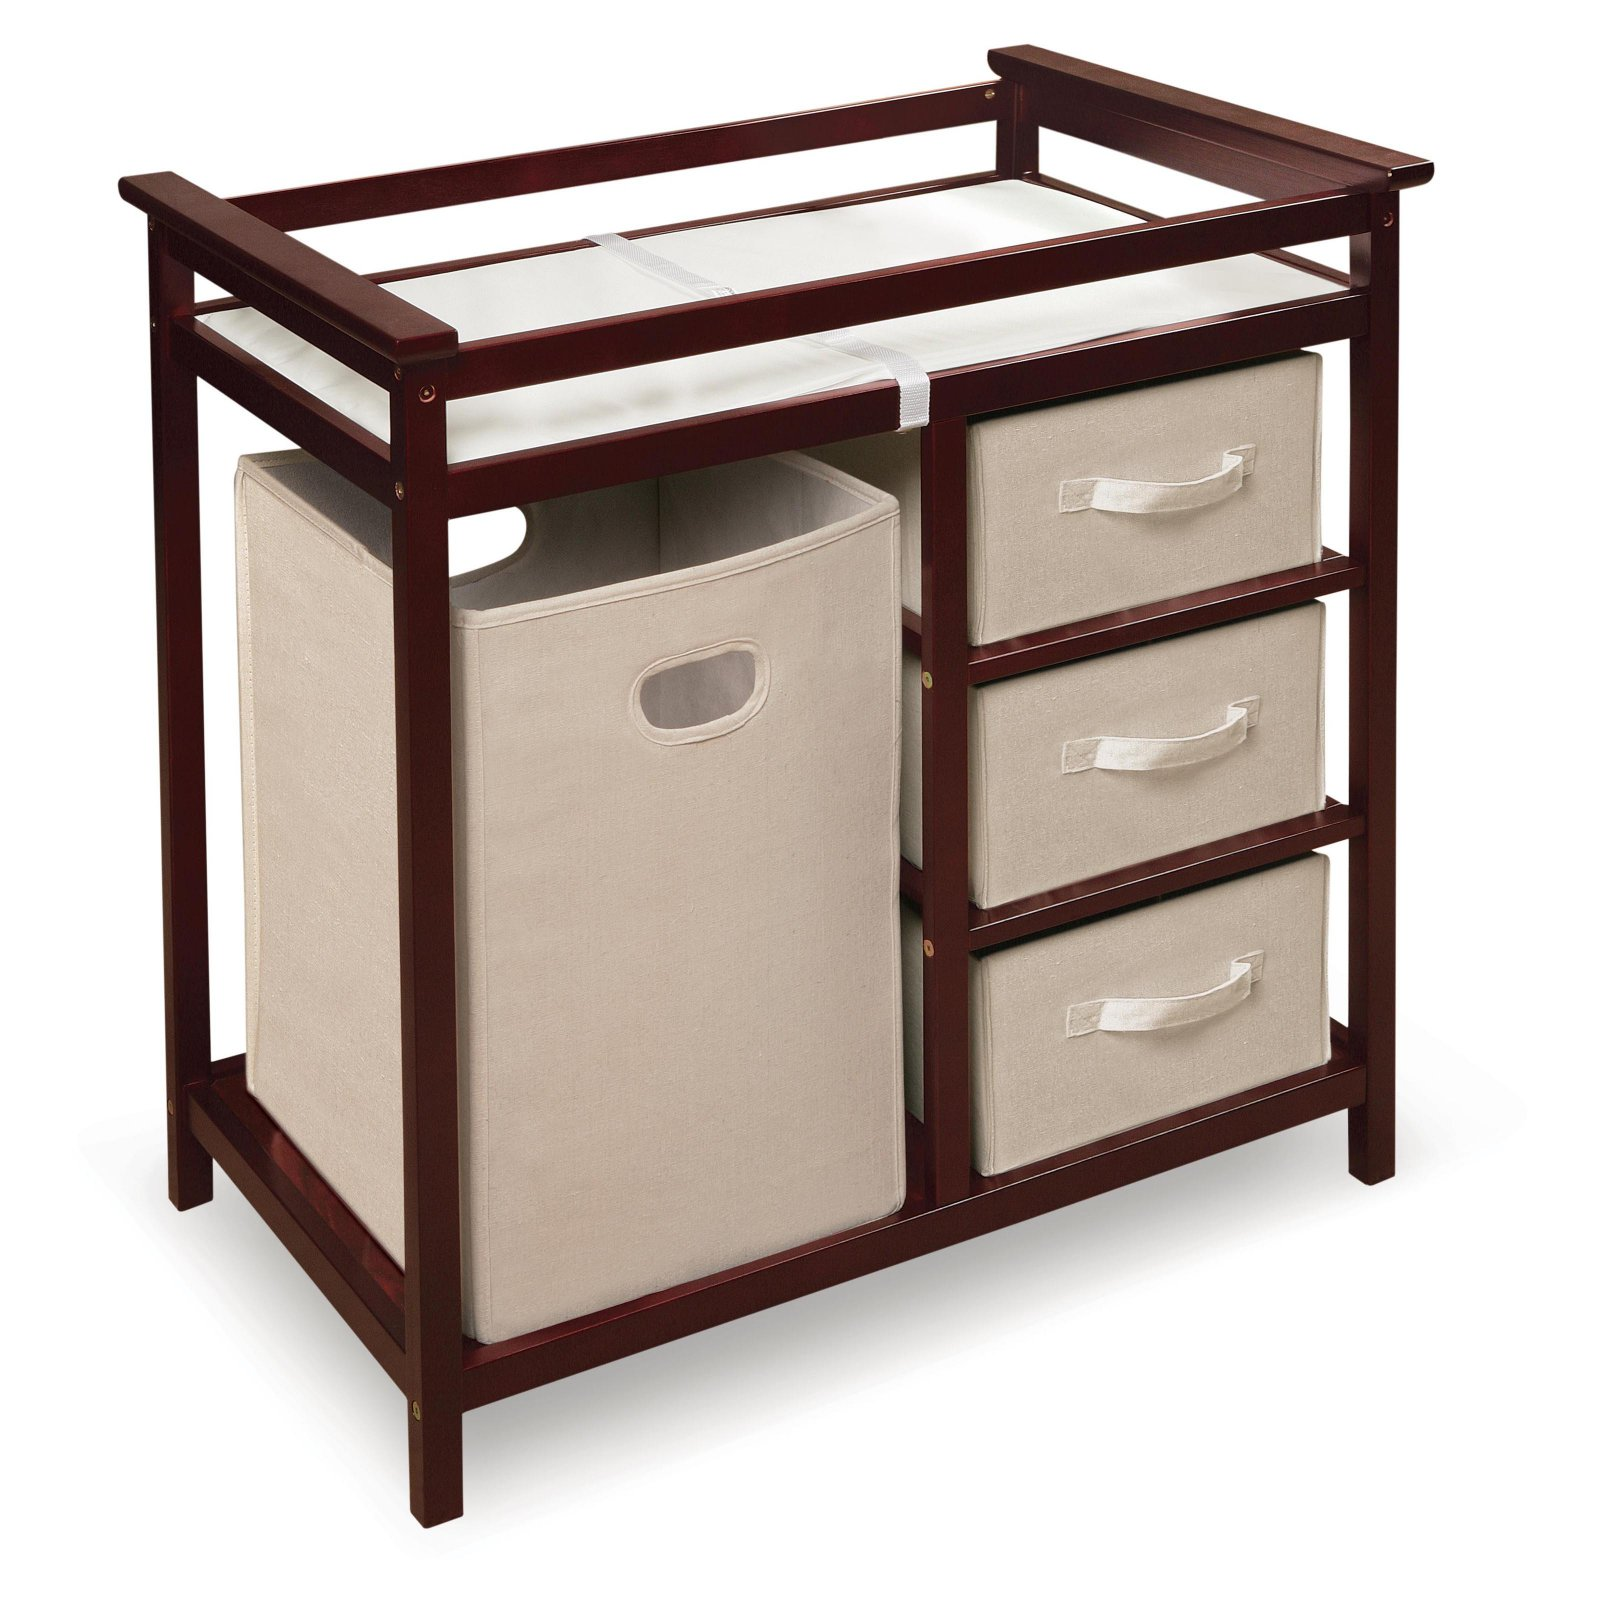 Badger Basket Modern Changing Table with 3 Baskets and Hamper, Choose Your Finish